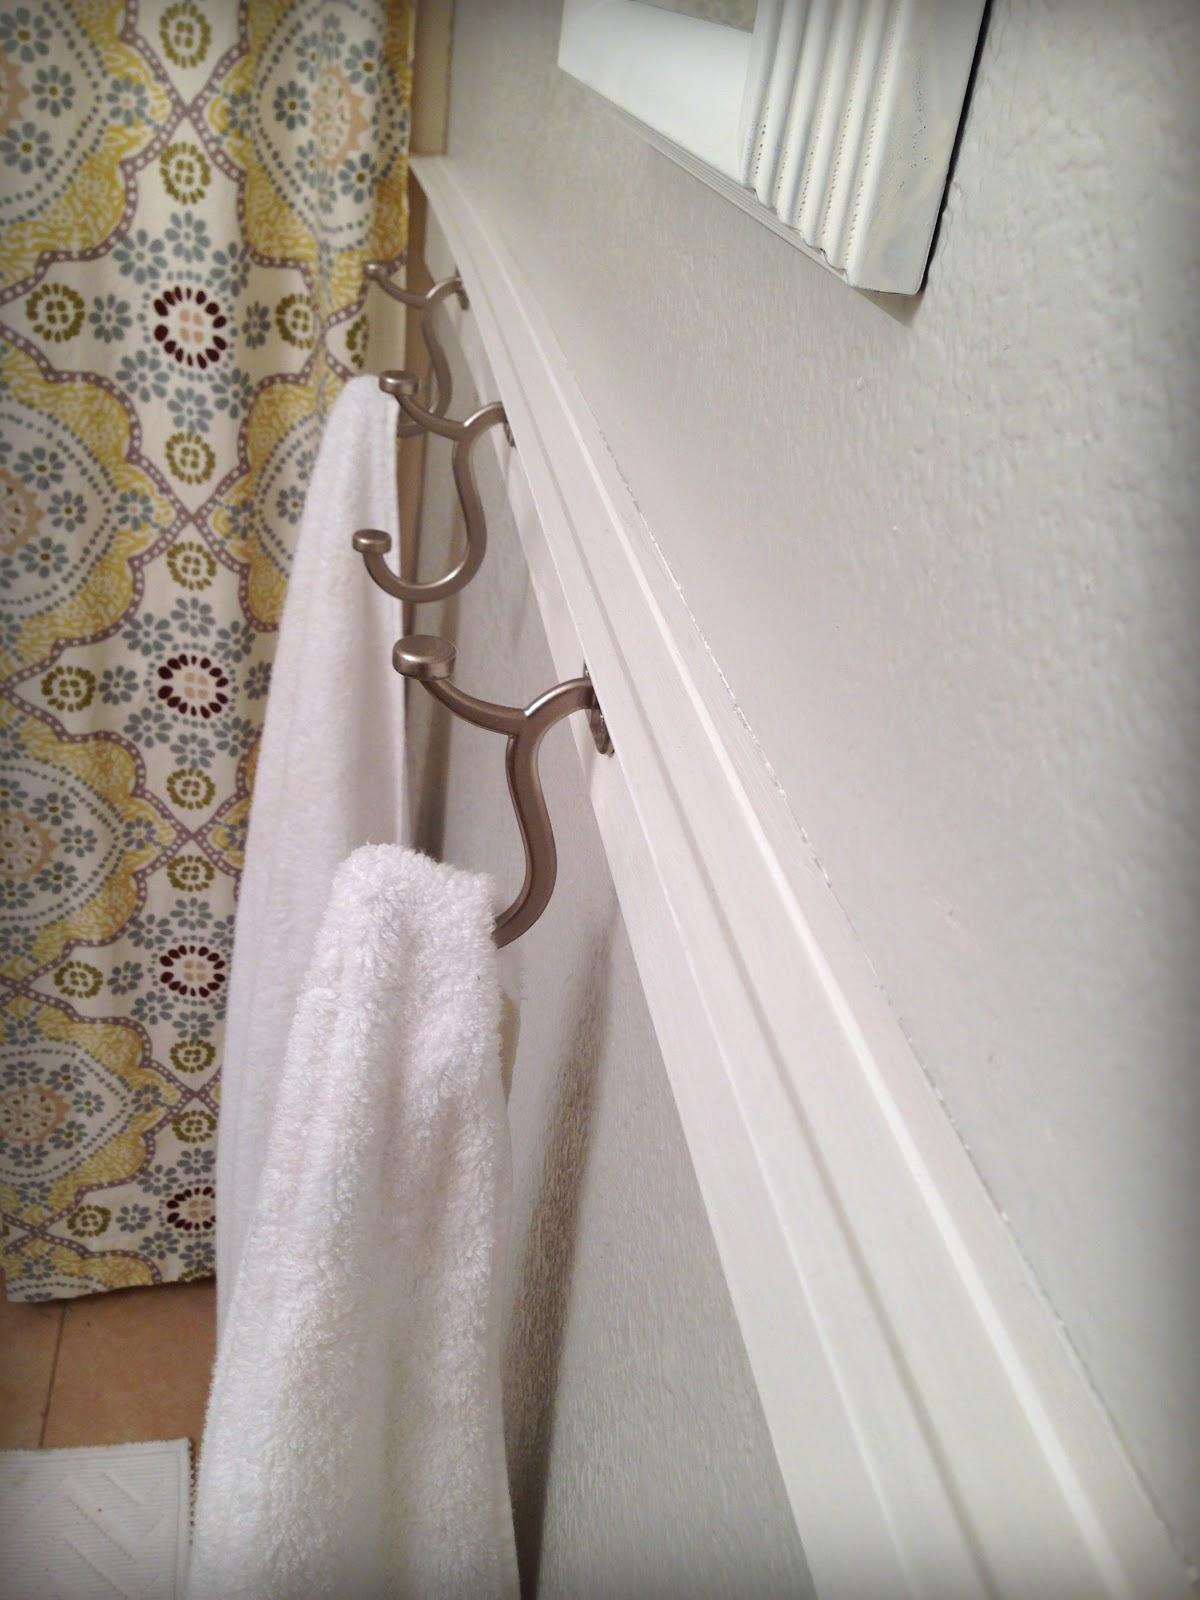 Decorative Bathroom Towel Hooks Kaes Corner Design Towel Hooks Art And Crashing Shelves